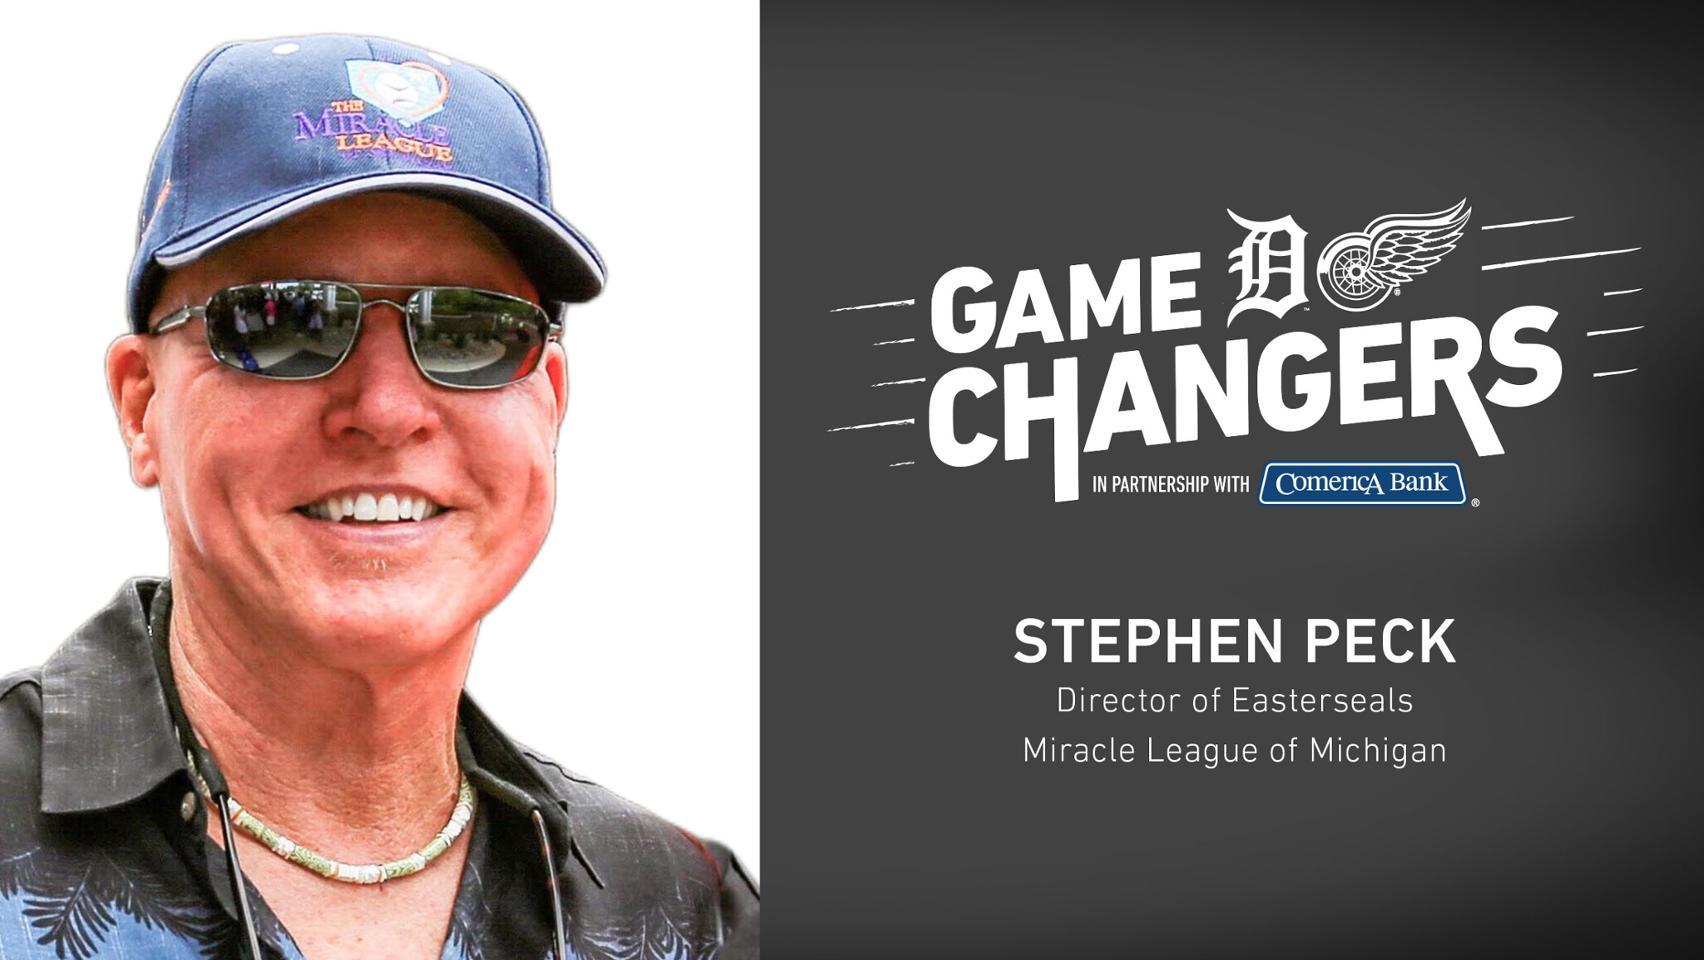 Stephen Peck